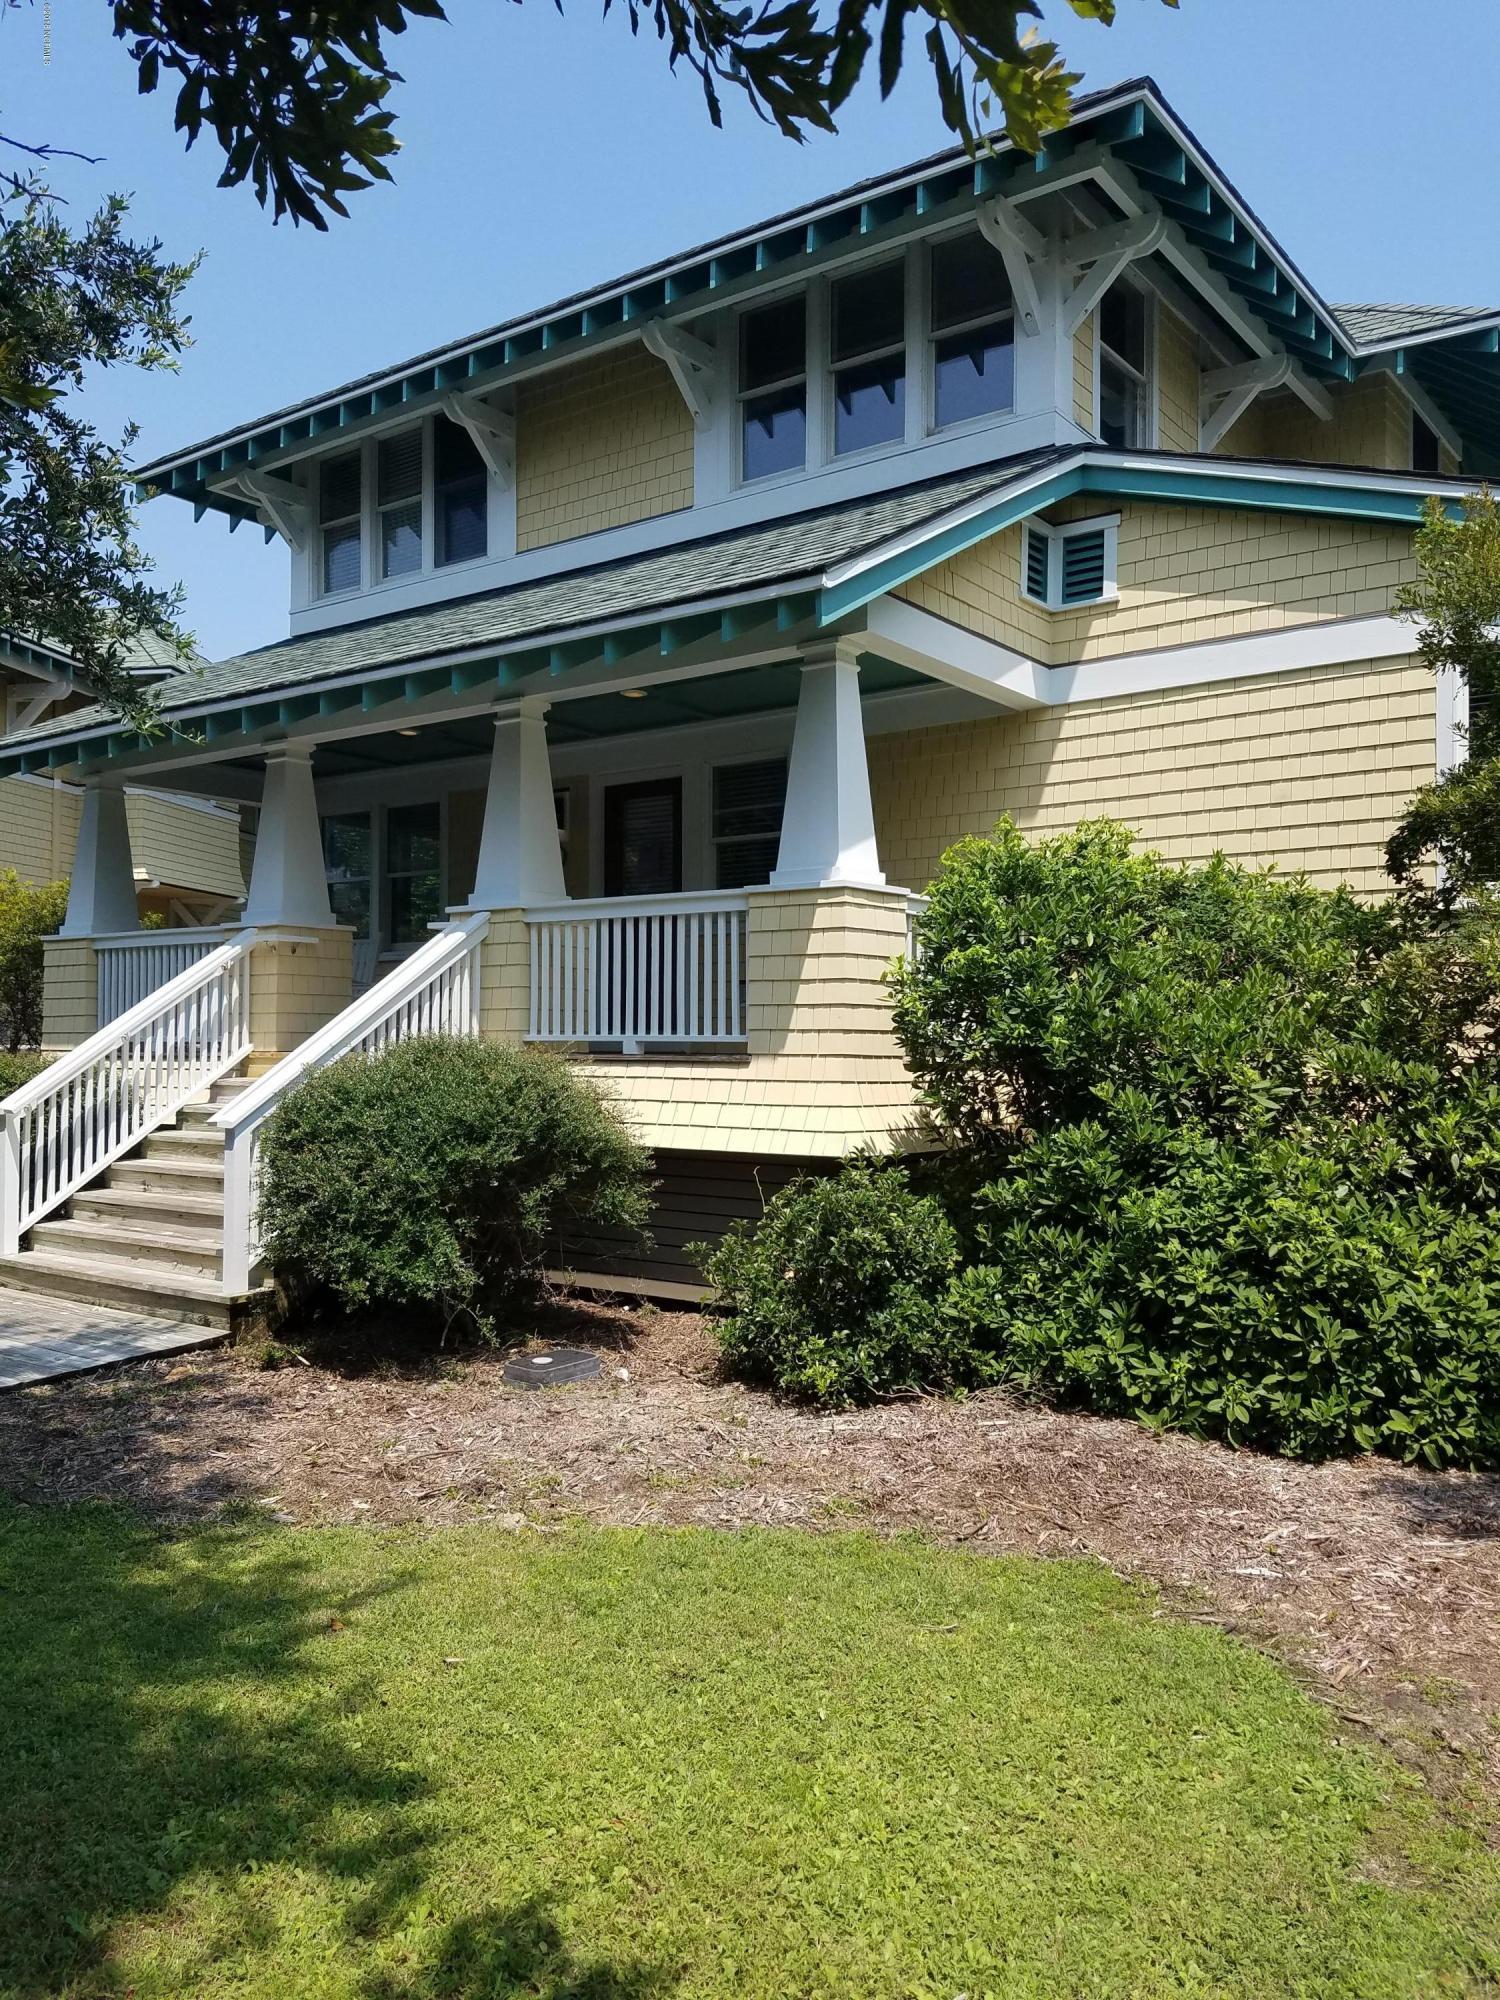 Carolina Plantations Real Estate - MLS Number: 100131803